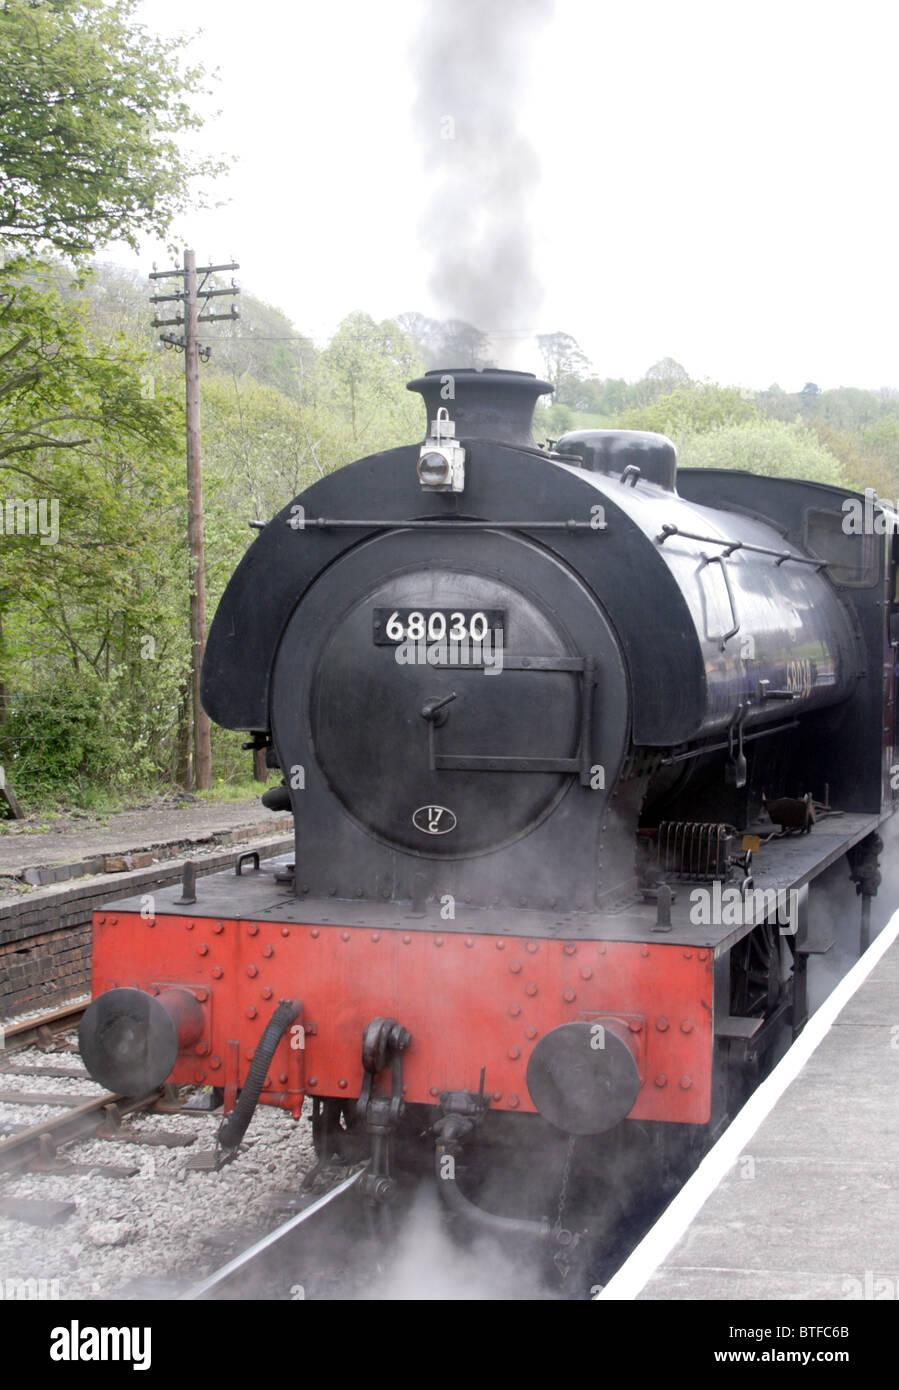 Cheddleton light steam railway - Stock Image